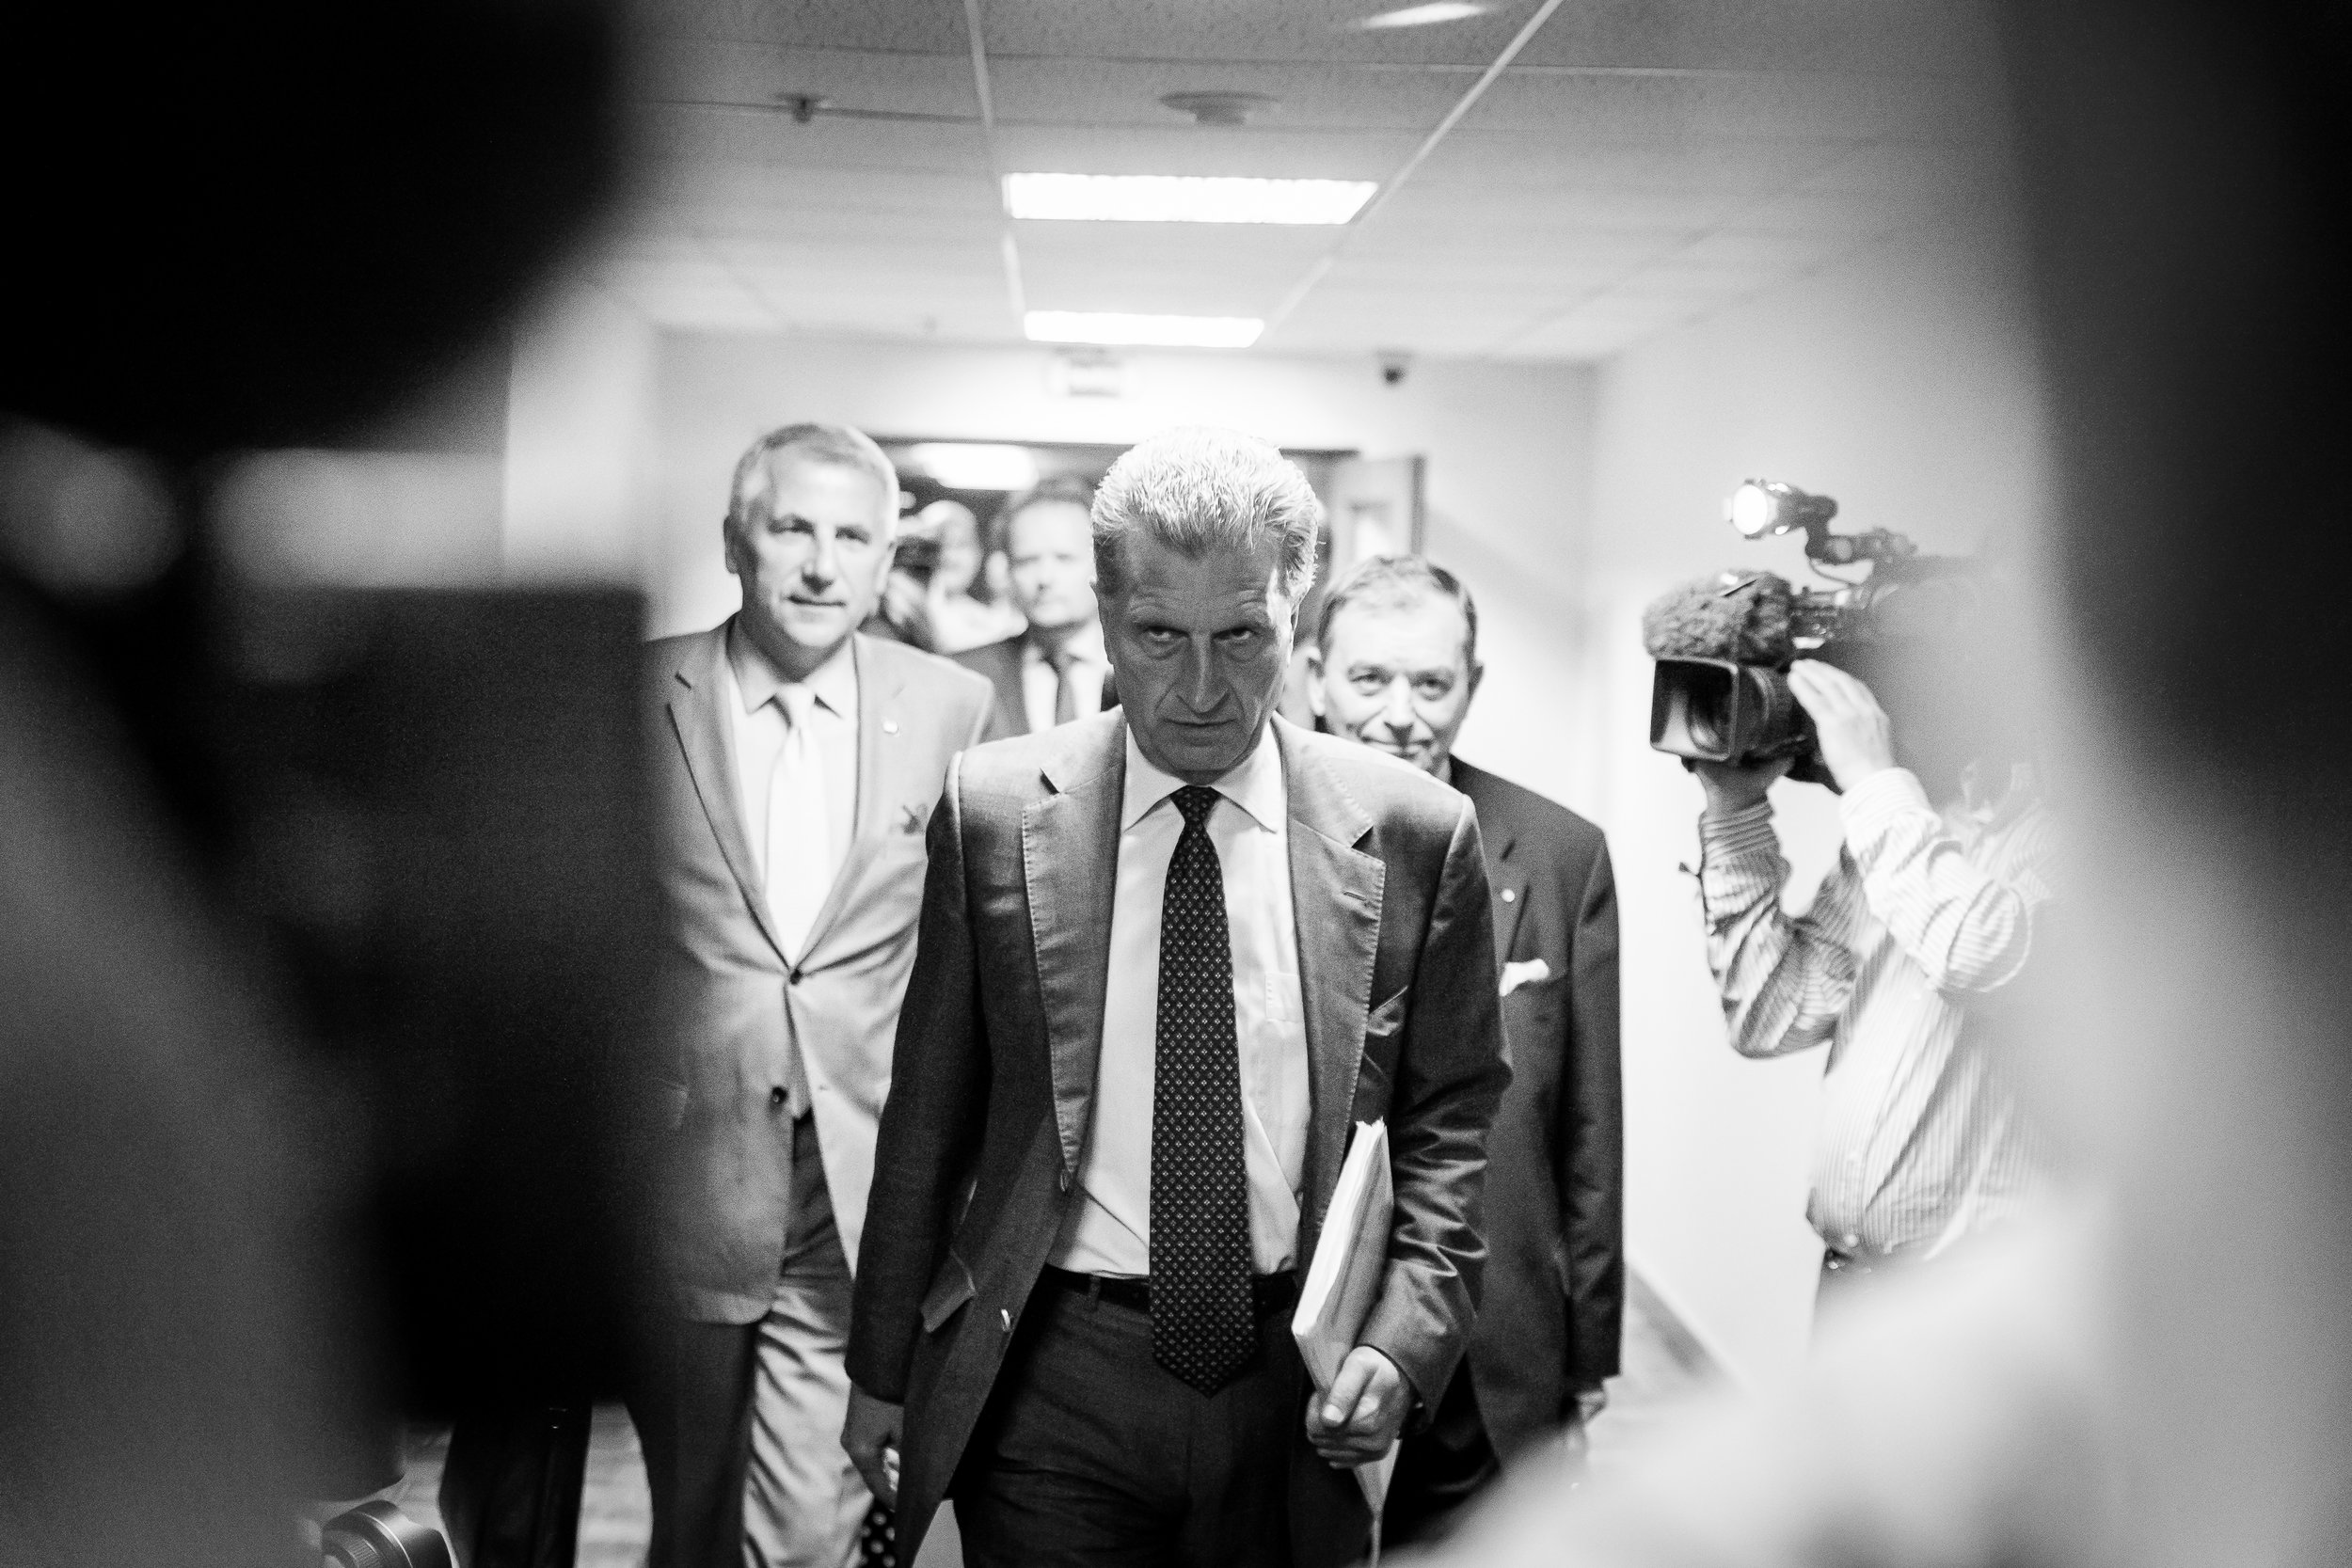 Günther Oettinger / EU